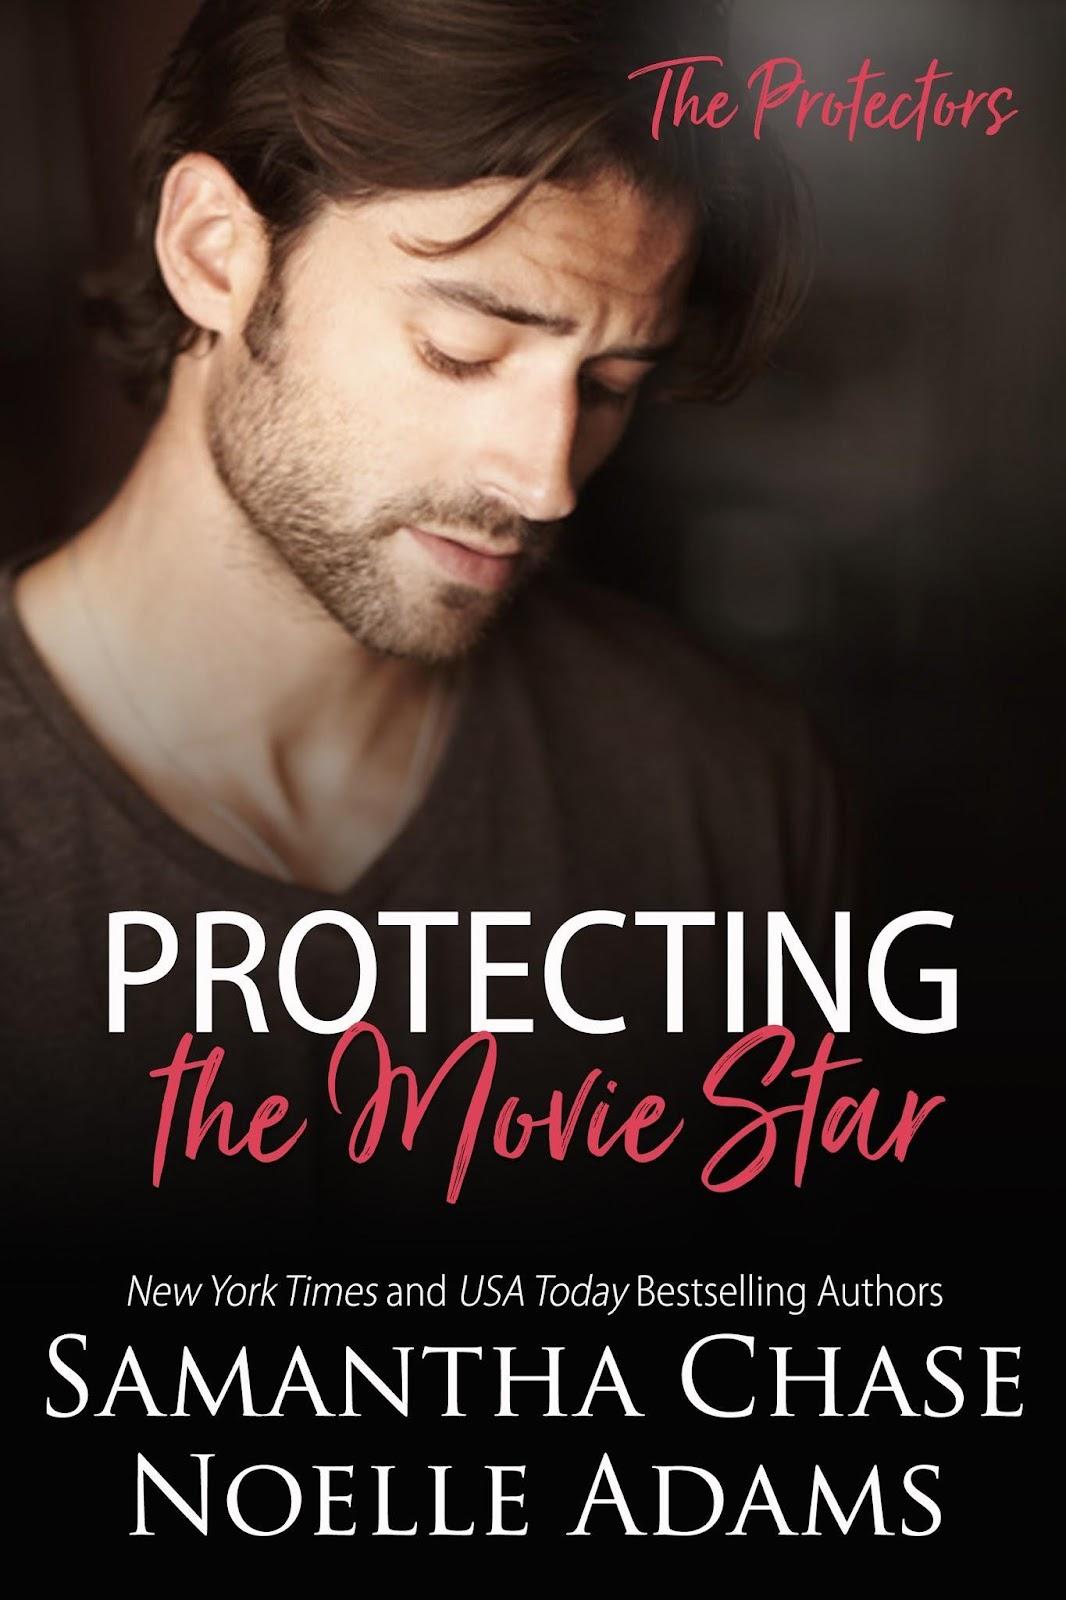 Protecting the Movie Star.jpg